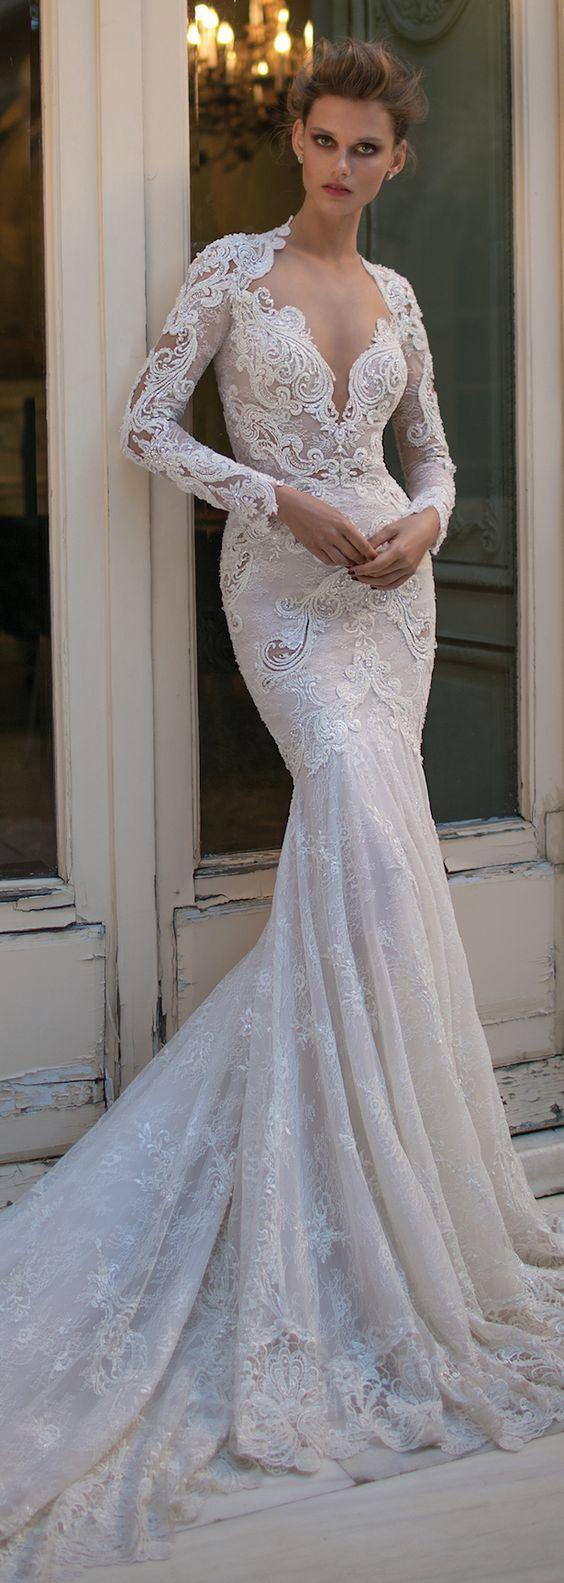 ead9975a5eed Berta Wedding Dress Long Sleeve Lace - raveitsafe